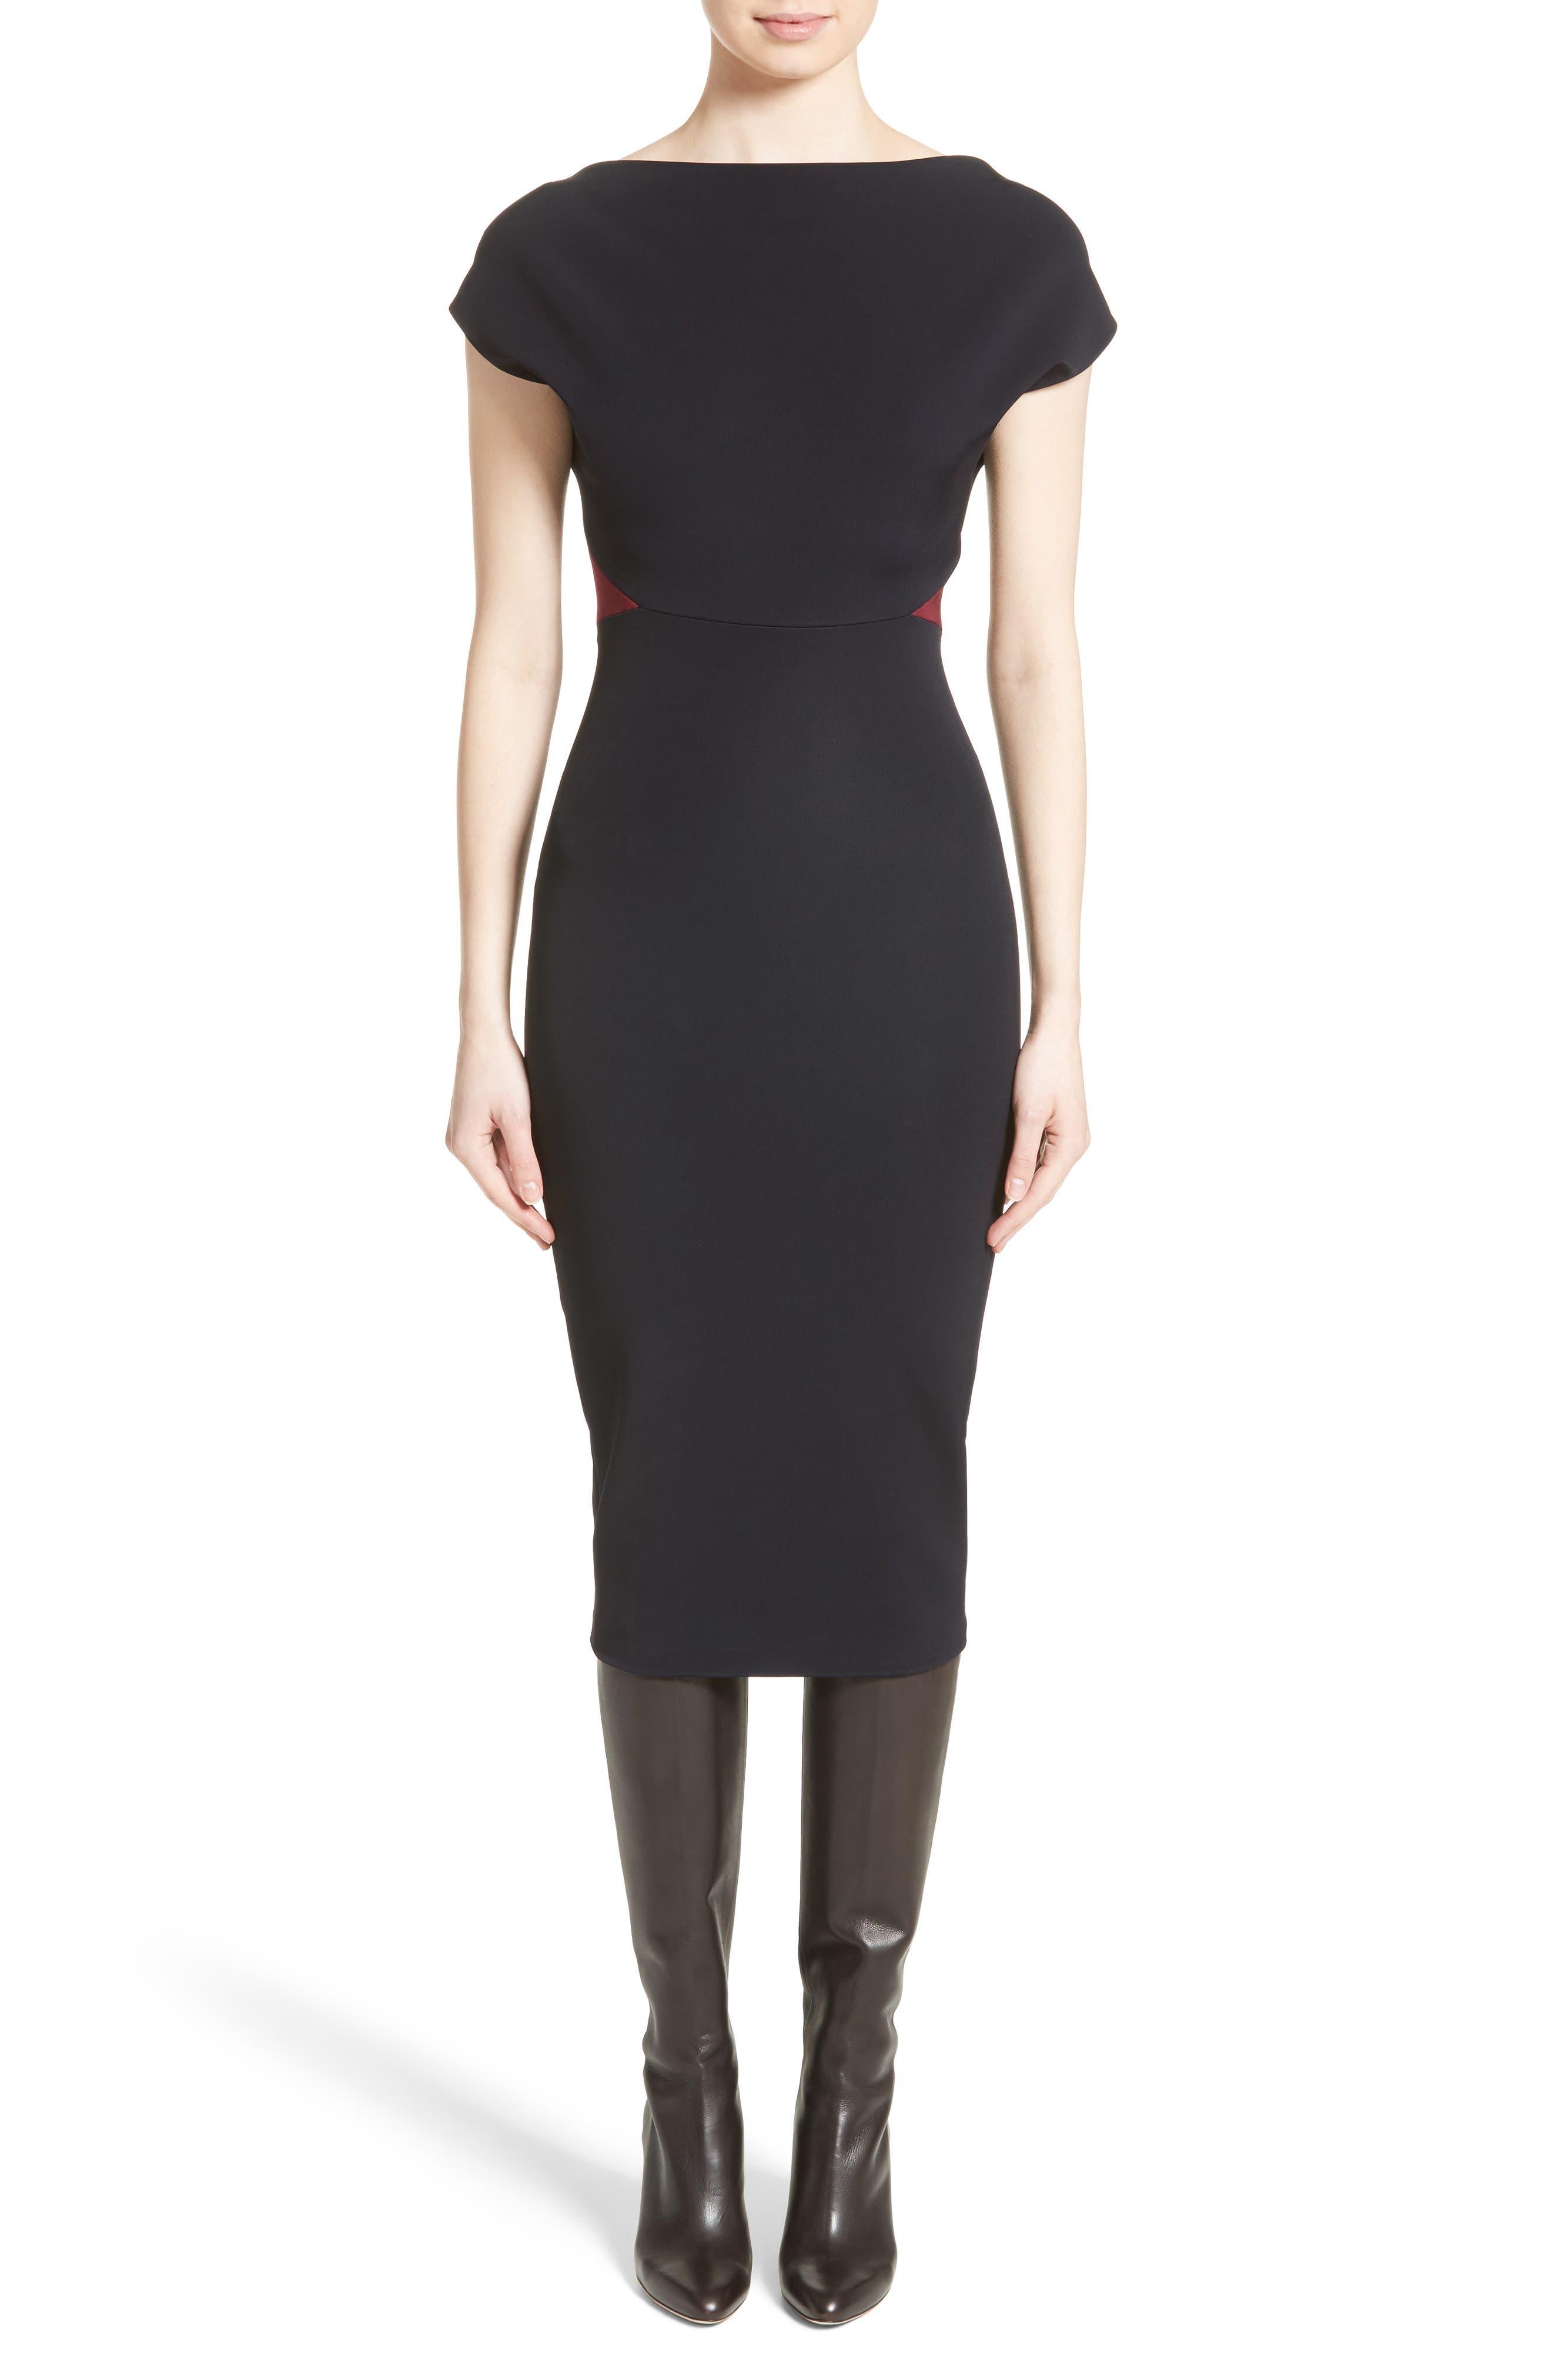 Main Image - Victoria Beckham Open Back Rib Knit Dress